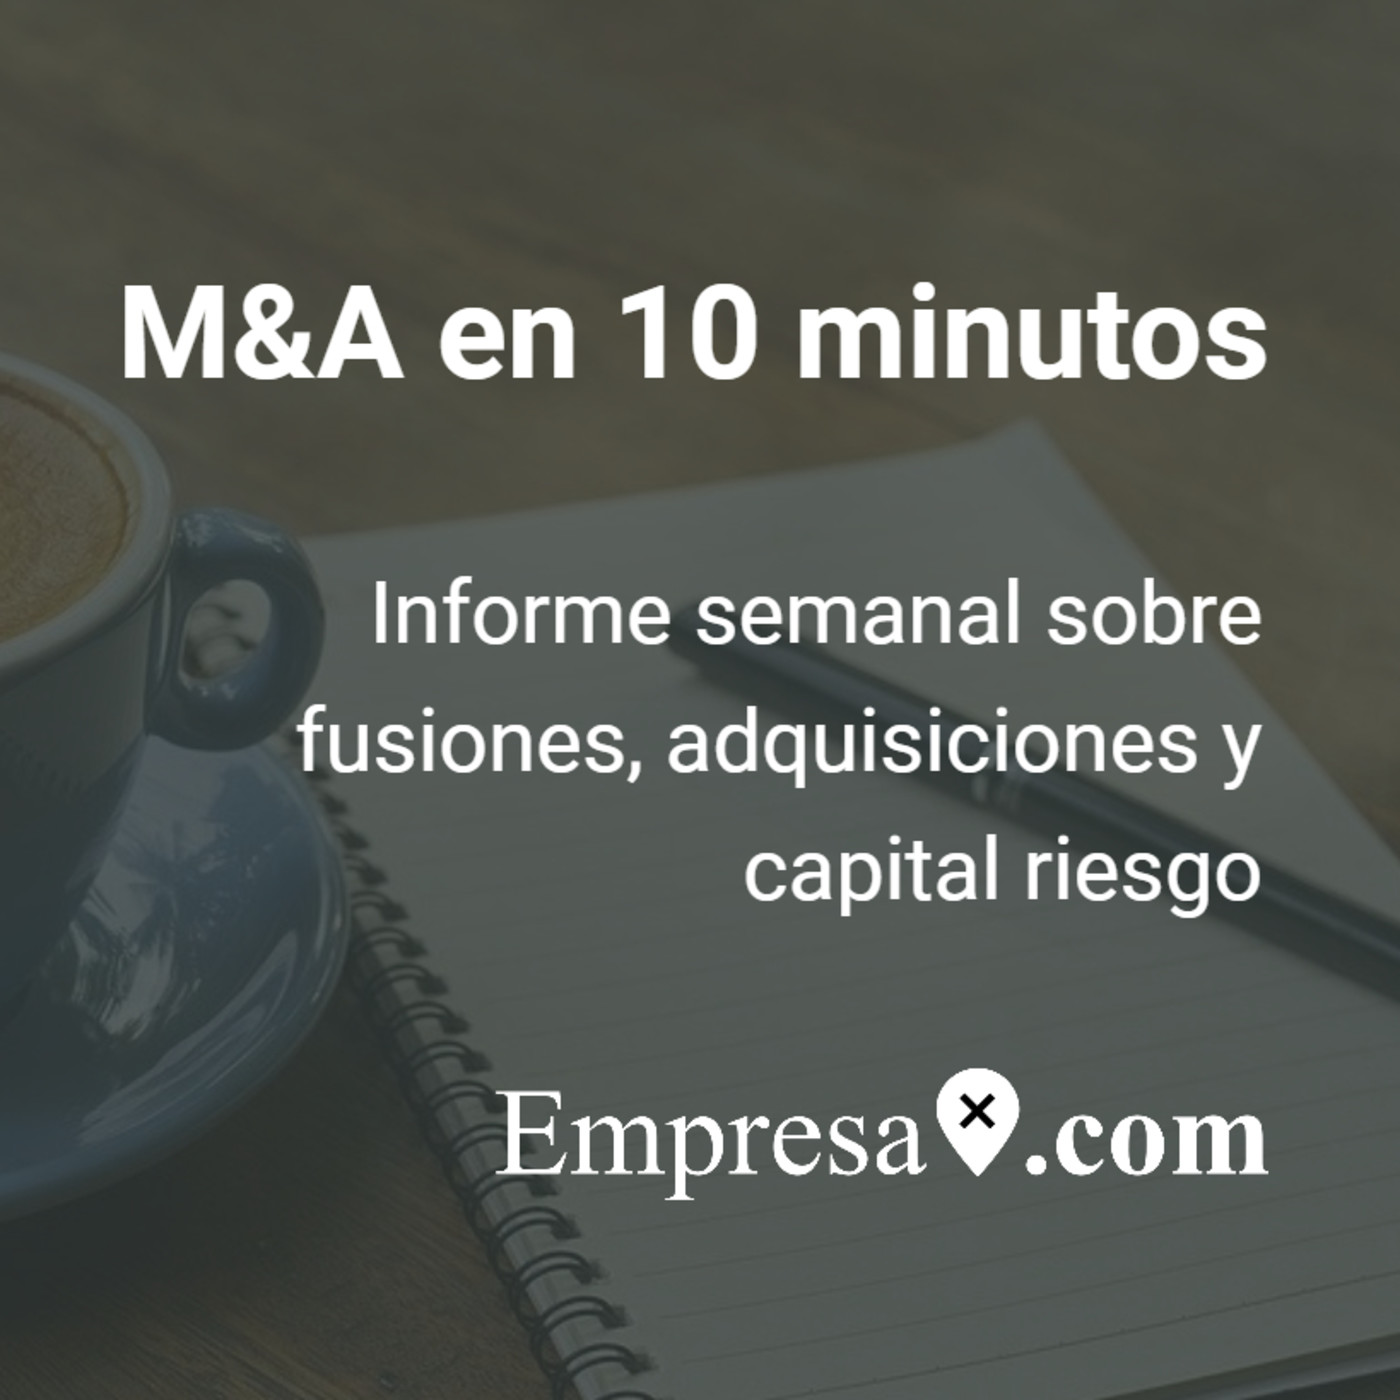 M&A en 10 minutos: MásMóvil, NPAW, Izertis, MealFood Europe